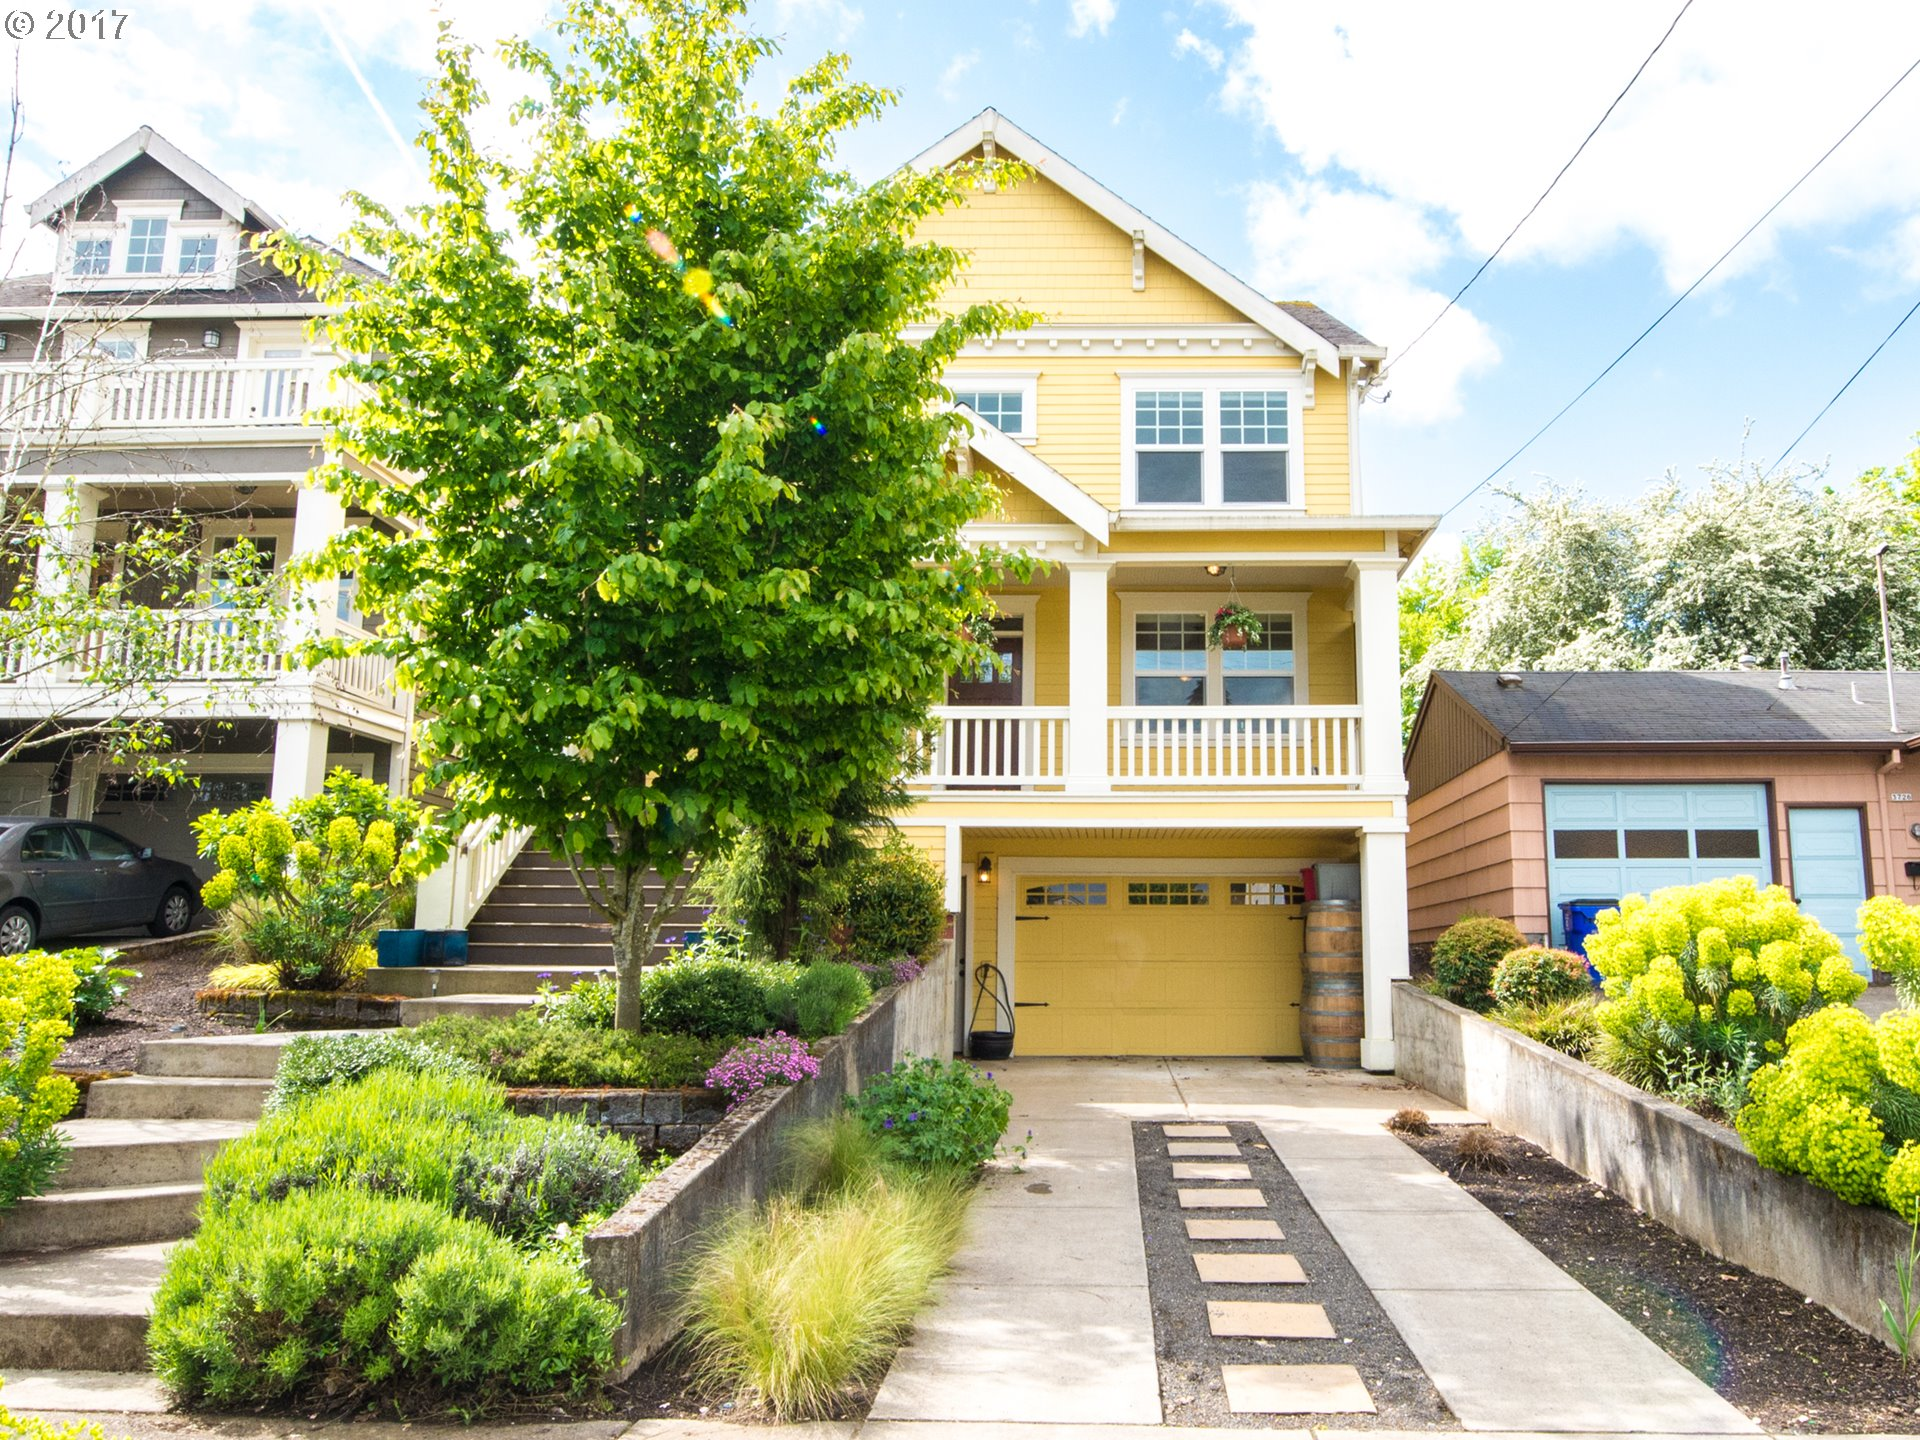 3738 NE HOLMAN ST, Portland OR 97211